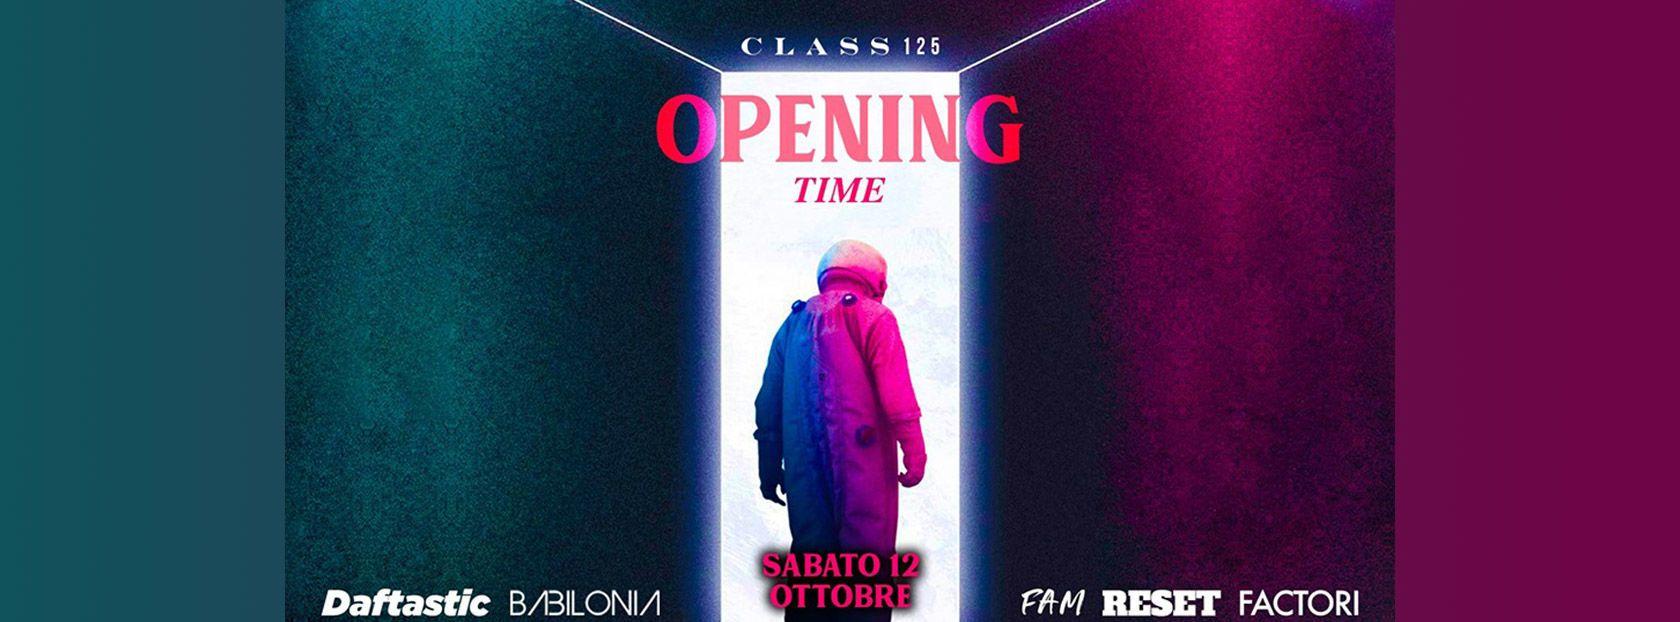 Class 125 - Class 125 - Opening Night